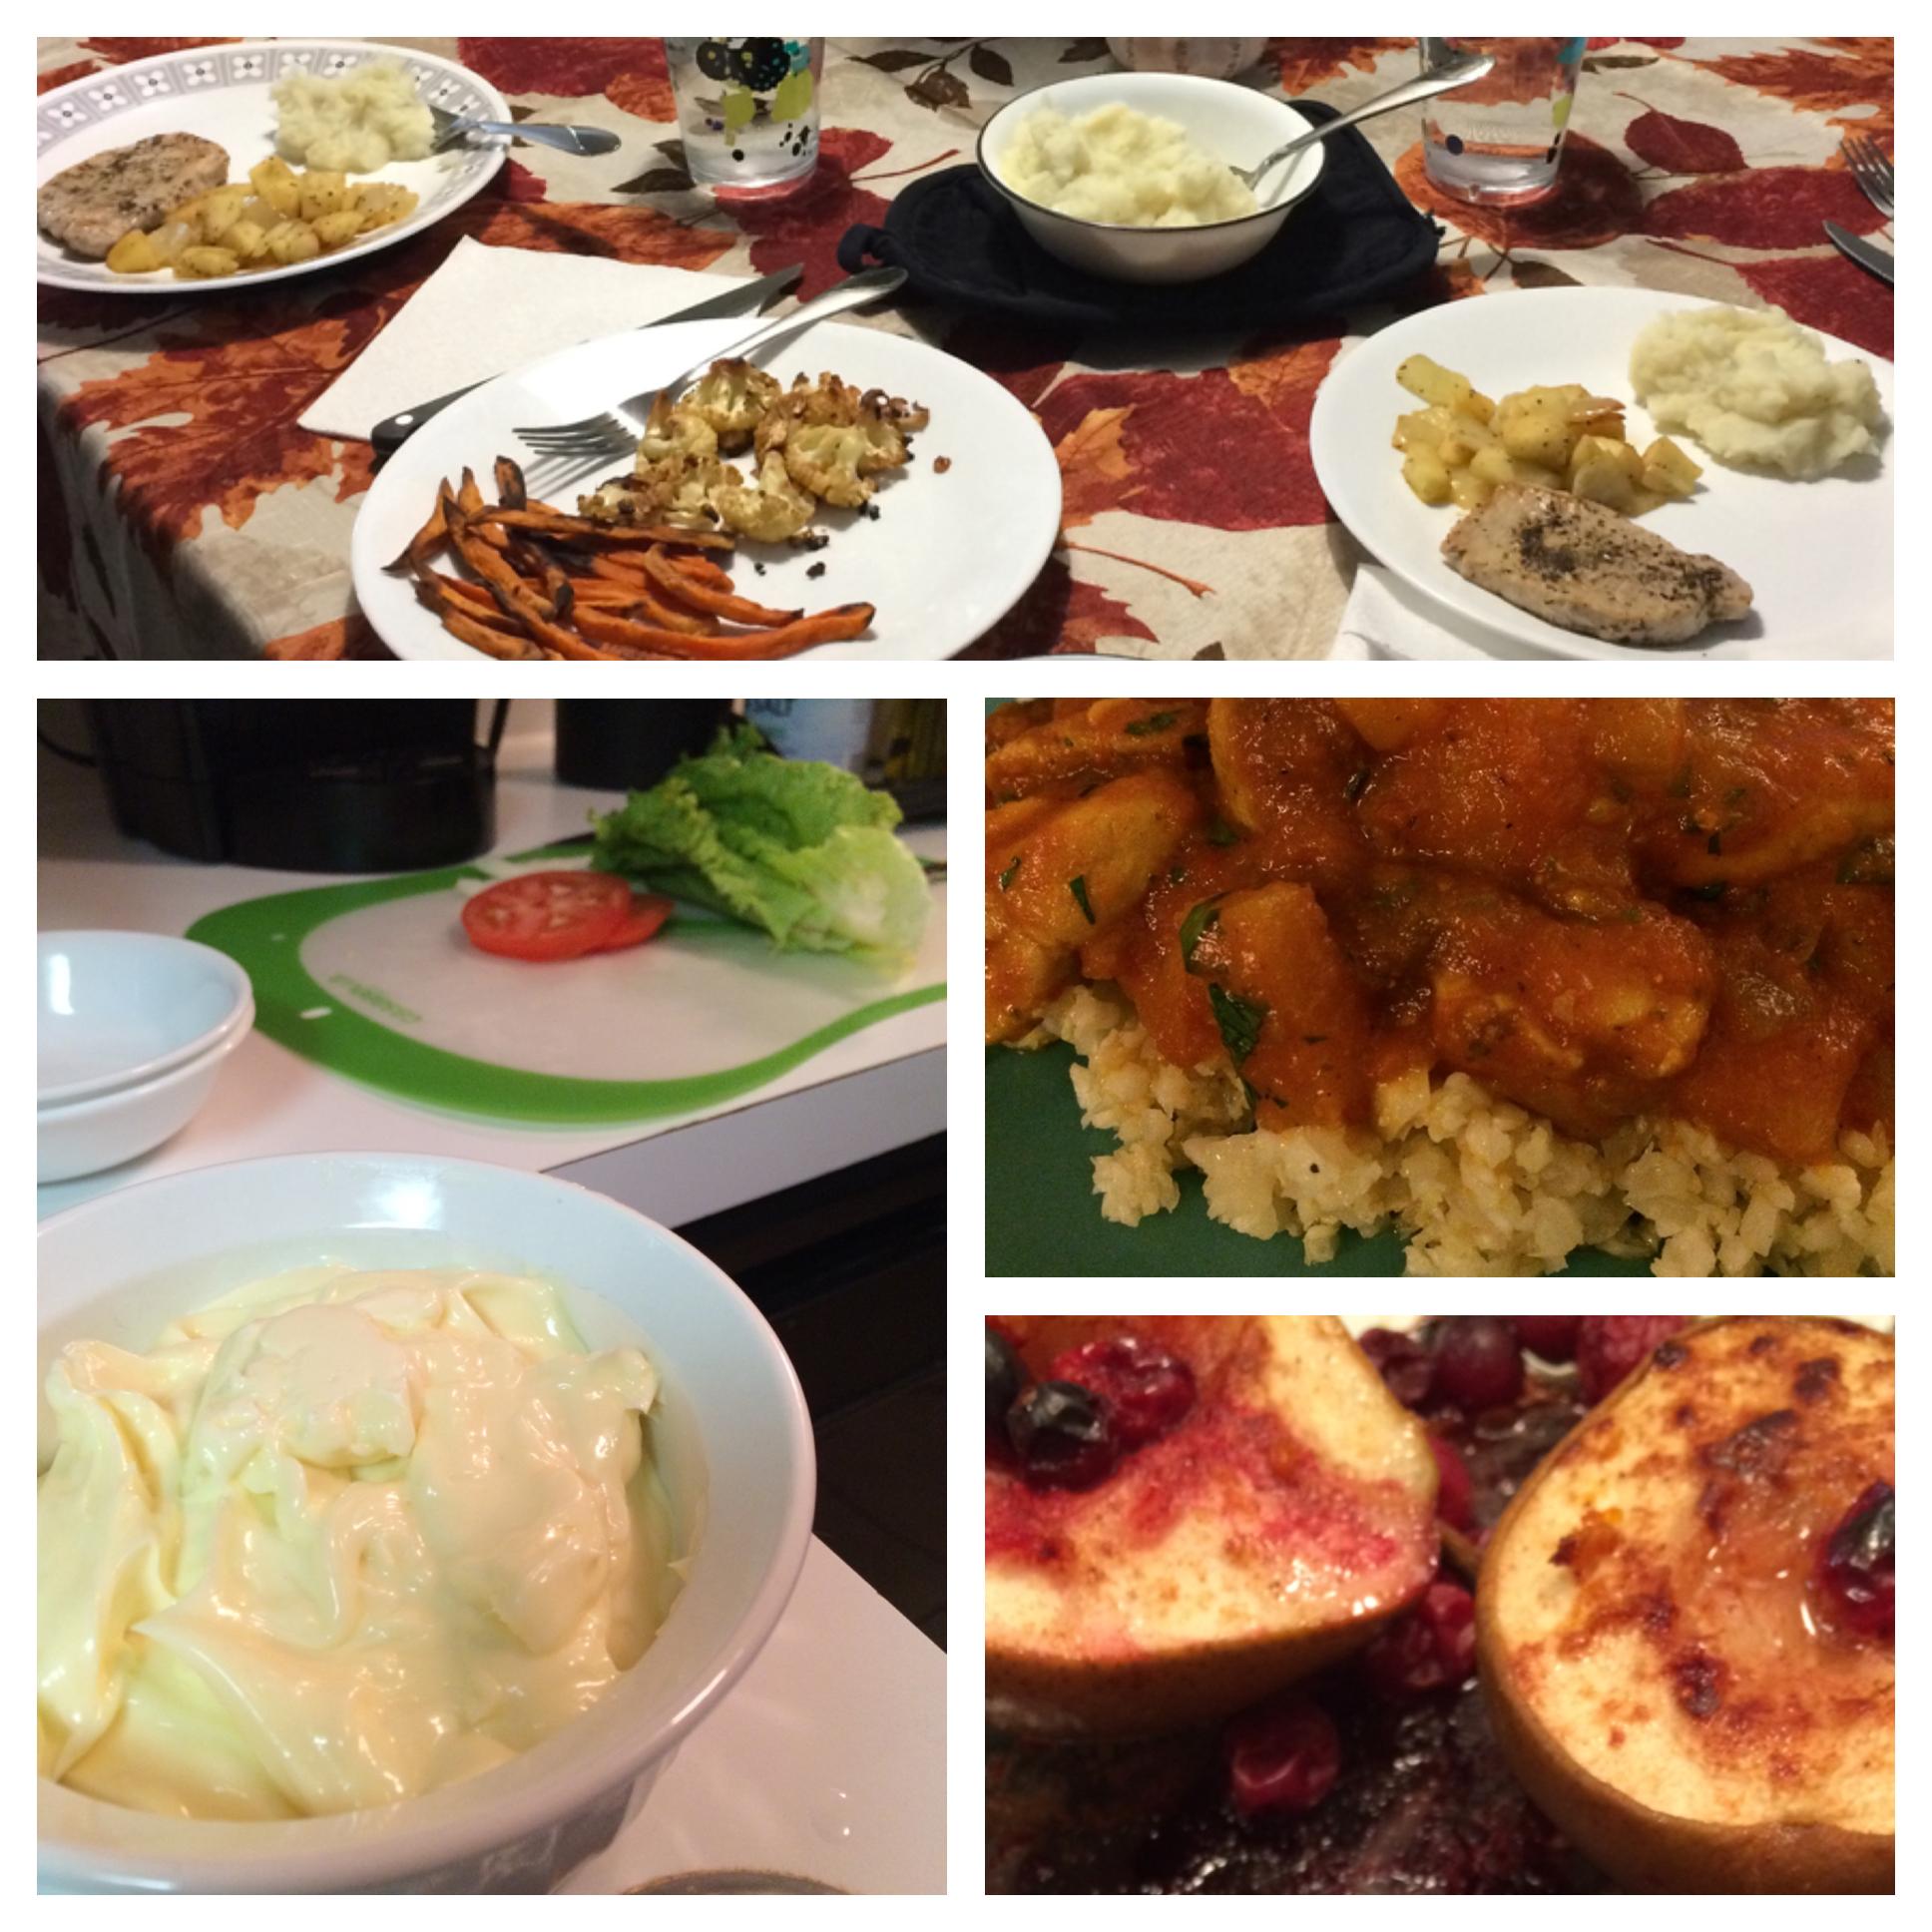 Paleo Food Collage 050115